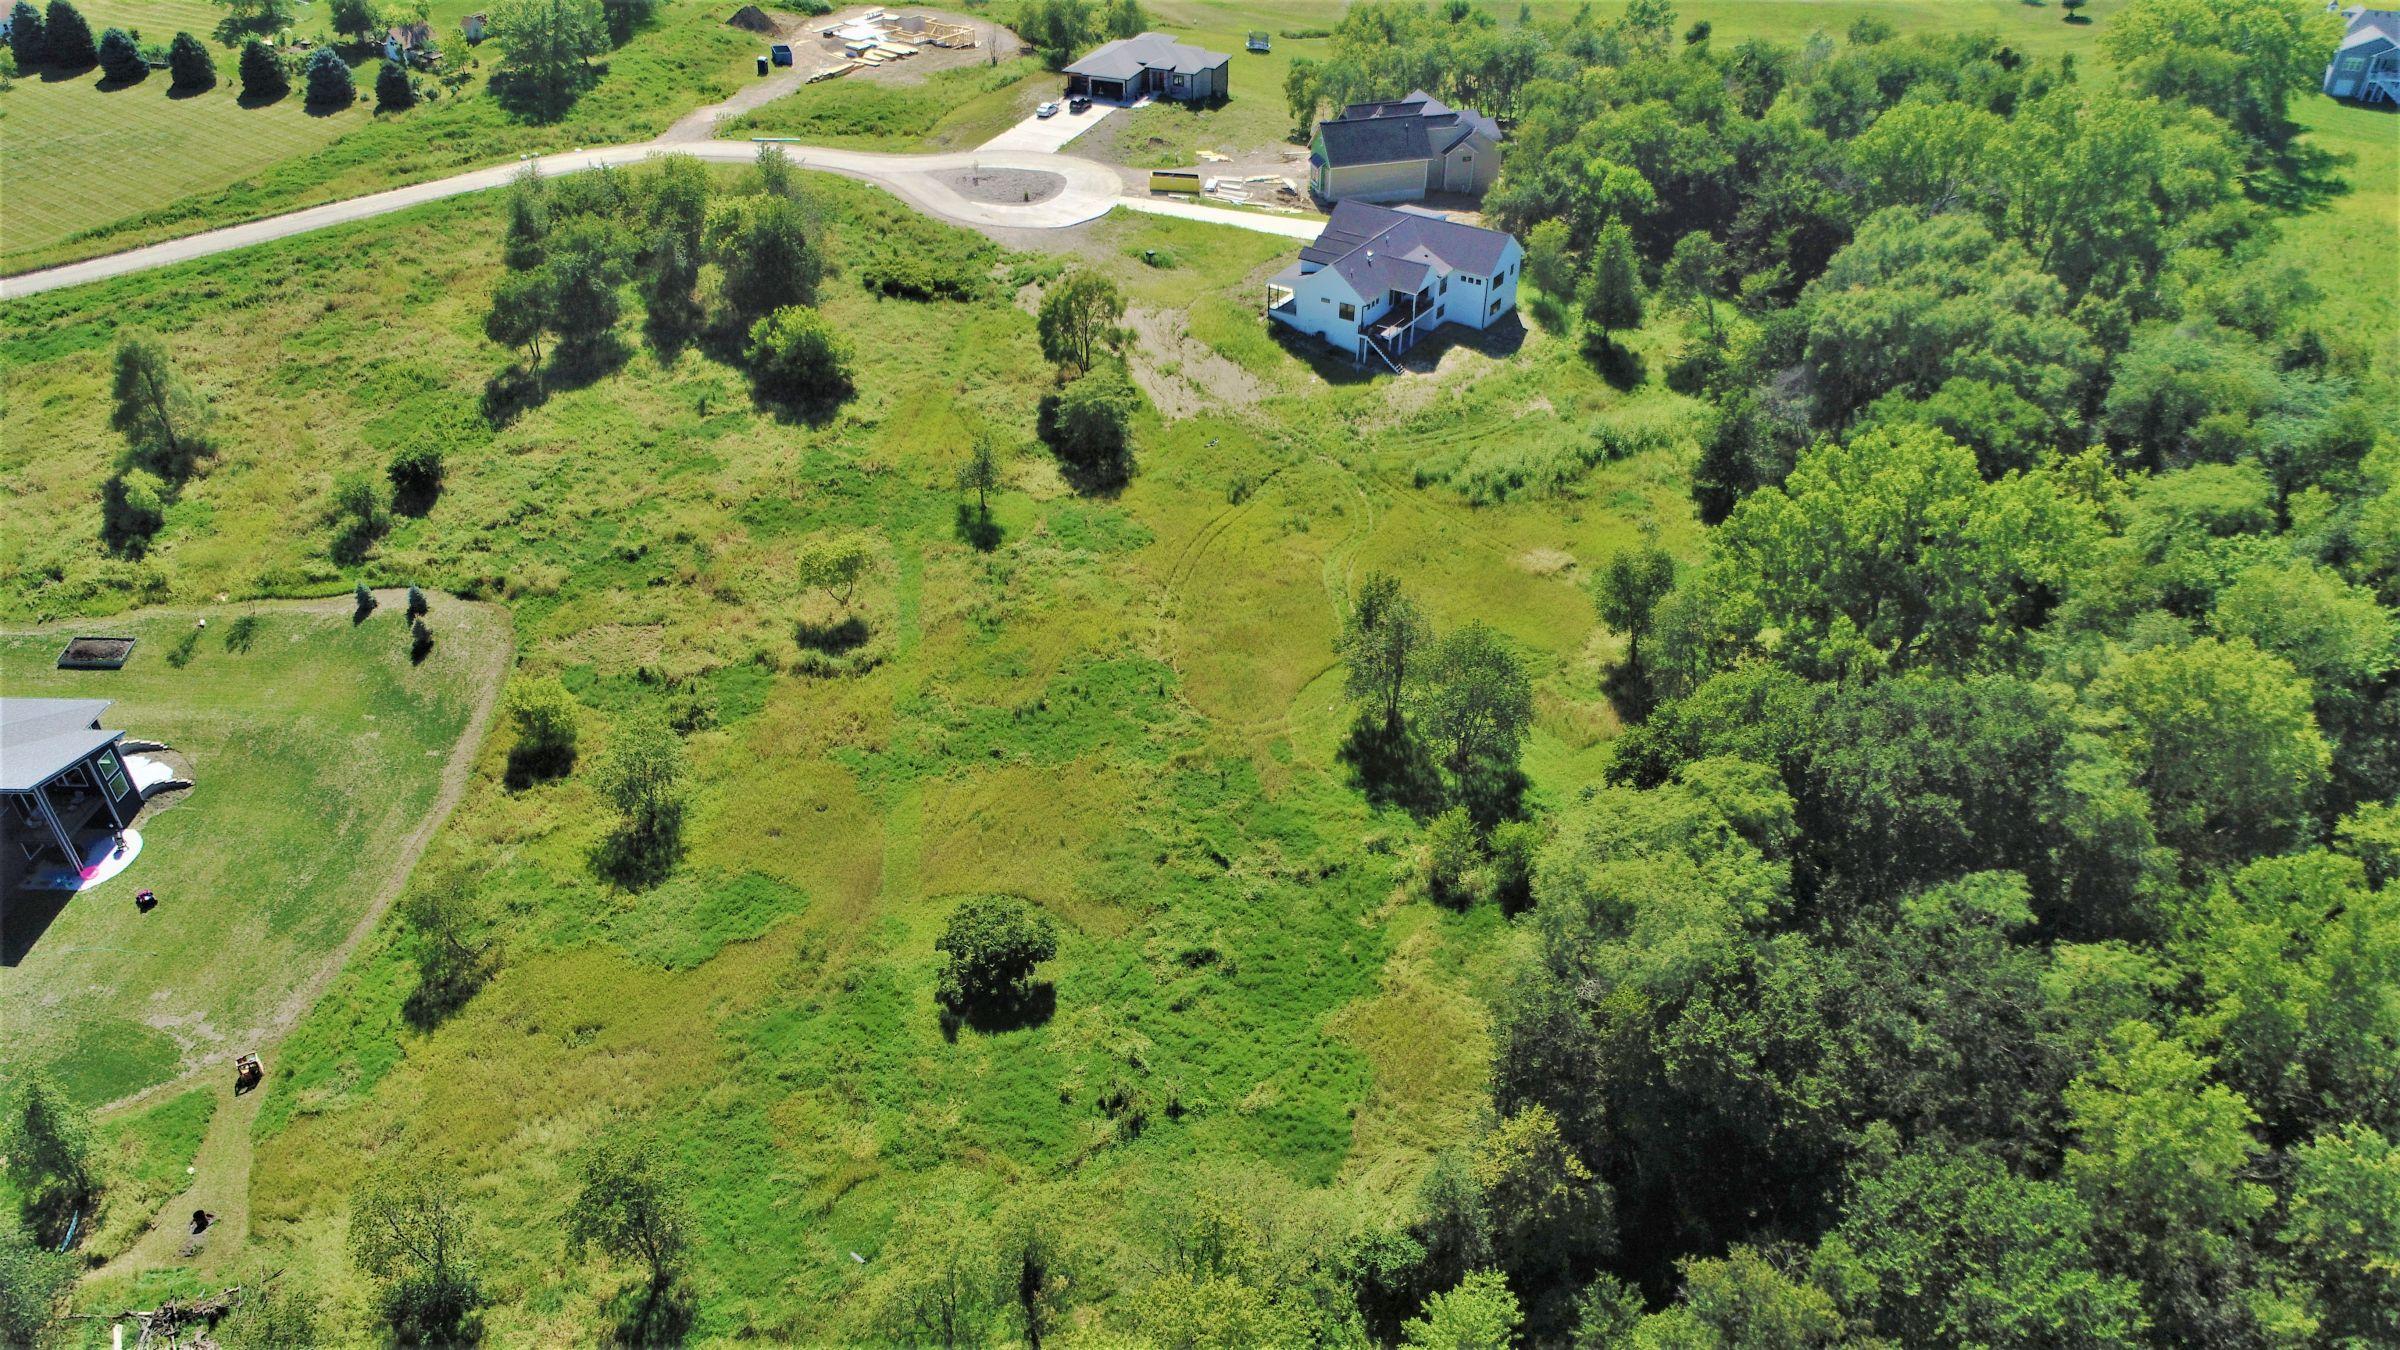 development-land-warren-county-iowa-2-acres-listing-number-15699-4-2021-08-20-205839.JPG